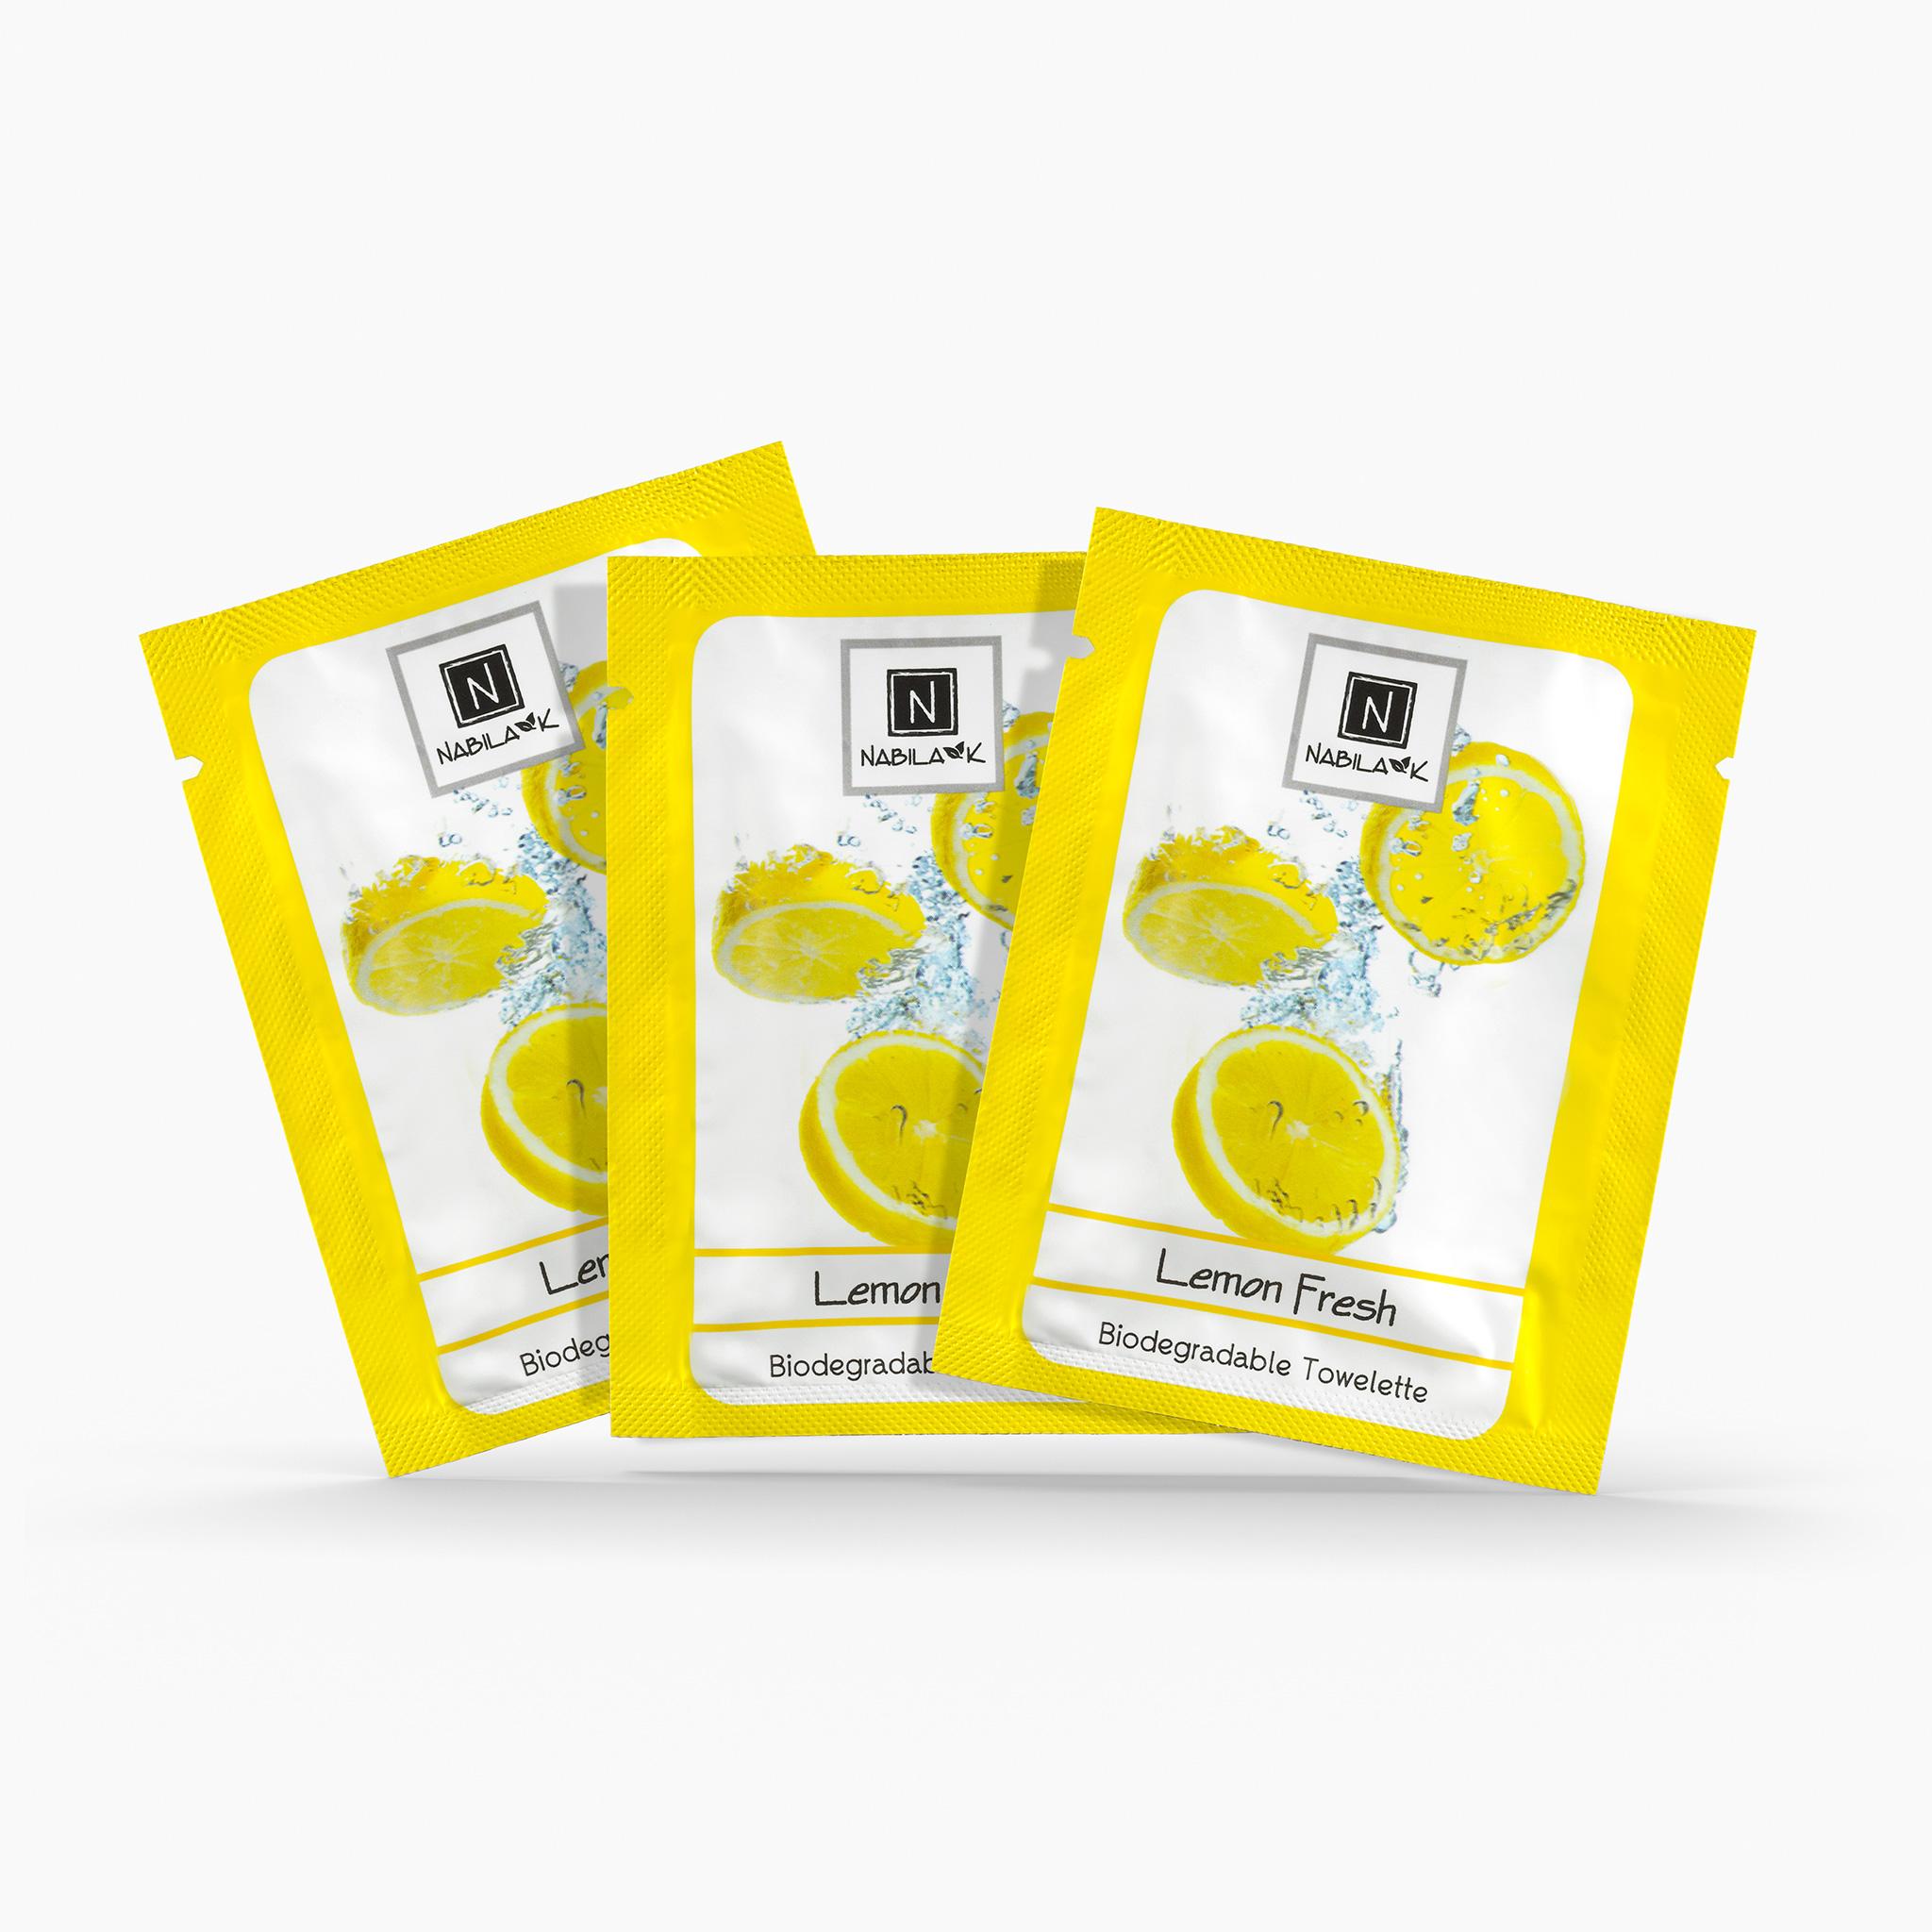 3 Single Use Packs of Nabila K's Lemon Fresh Biodegradable Towelettes